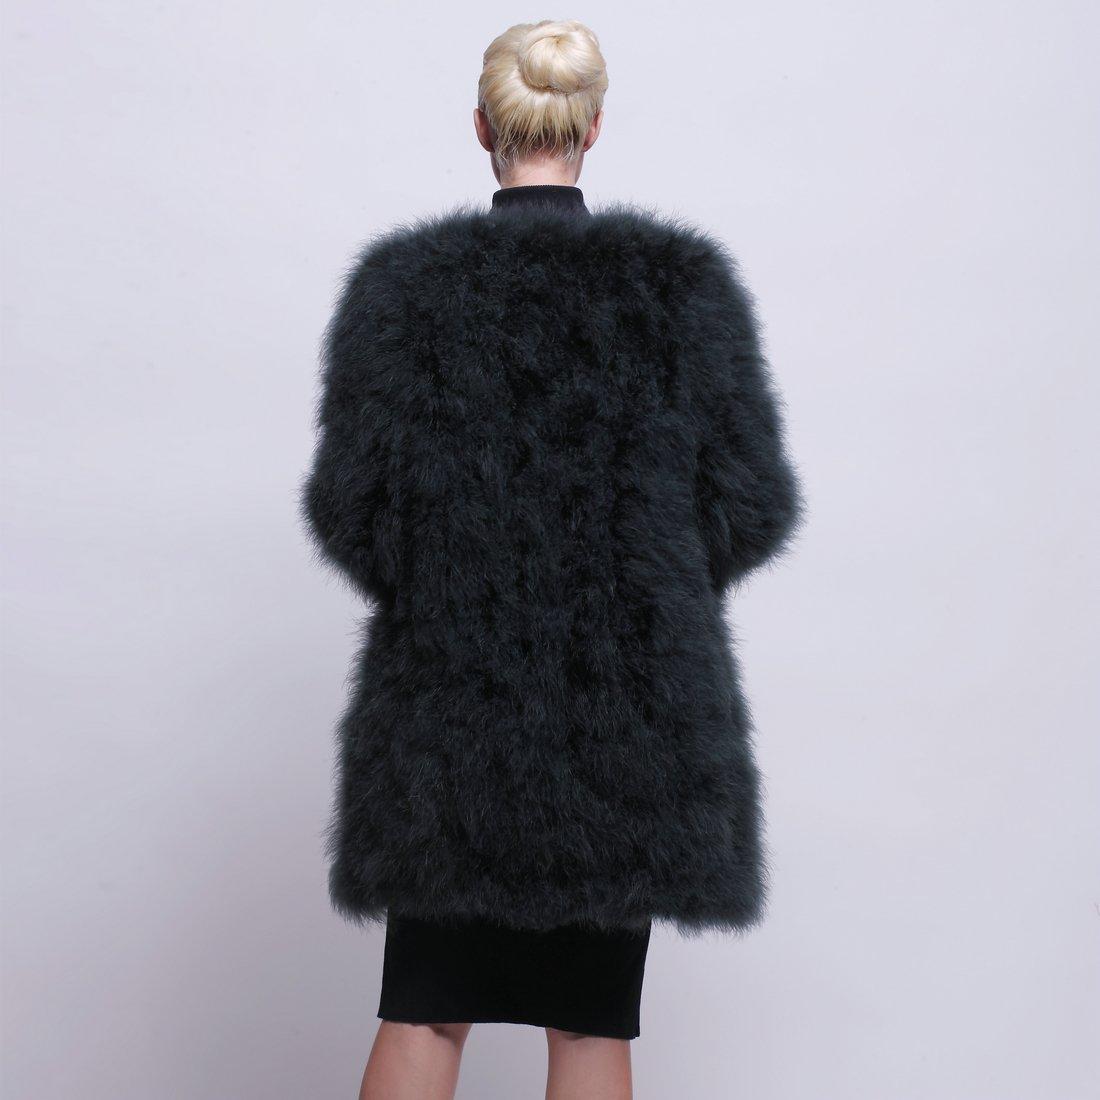 URSFUR Women Winter Jacket Real Ostrich Feather Fur Coat Opal Green XL by URSFUR (Image #3)